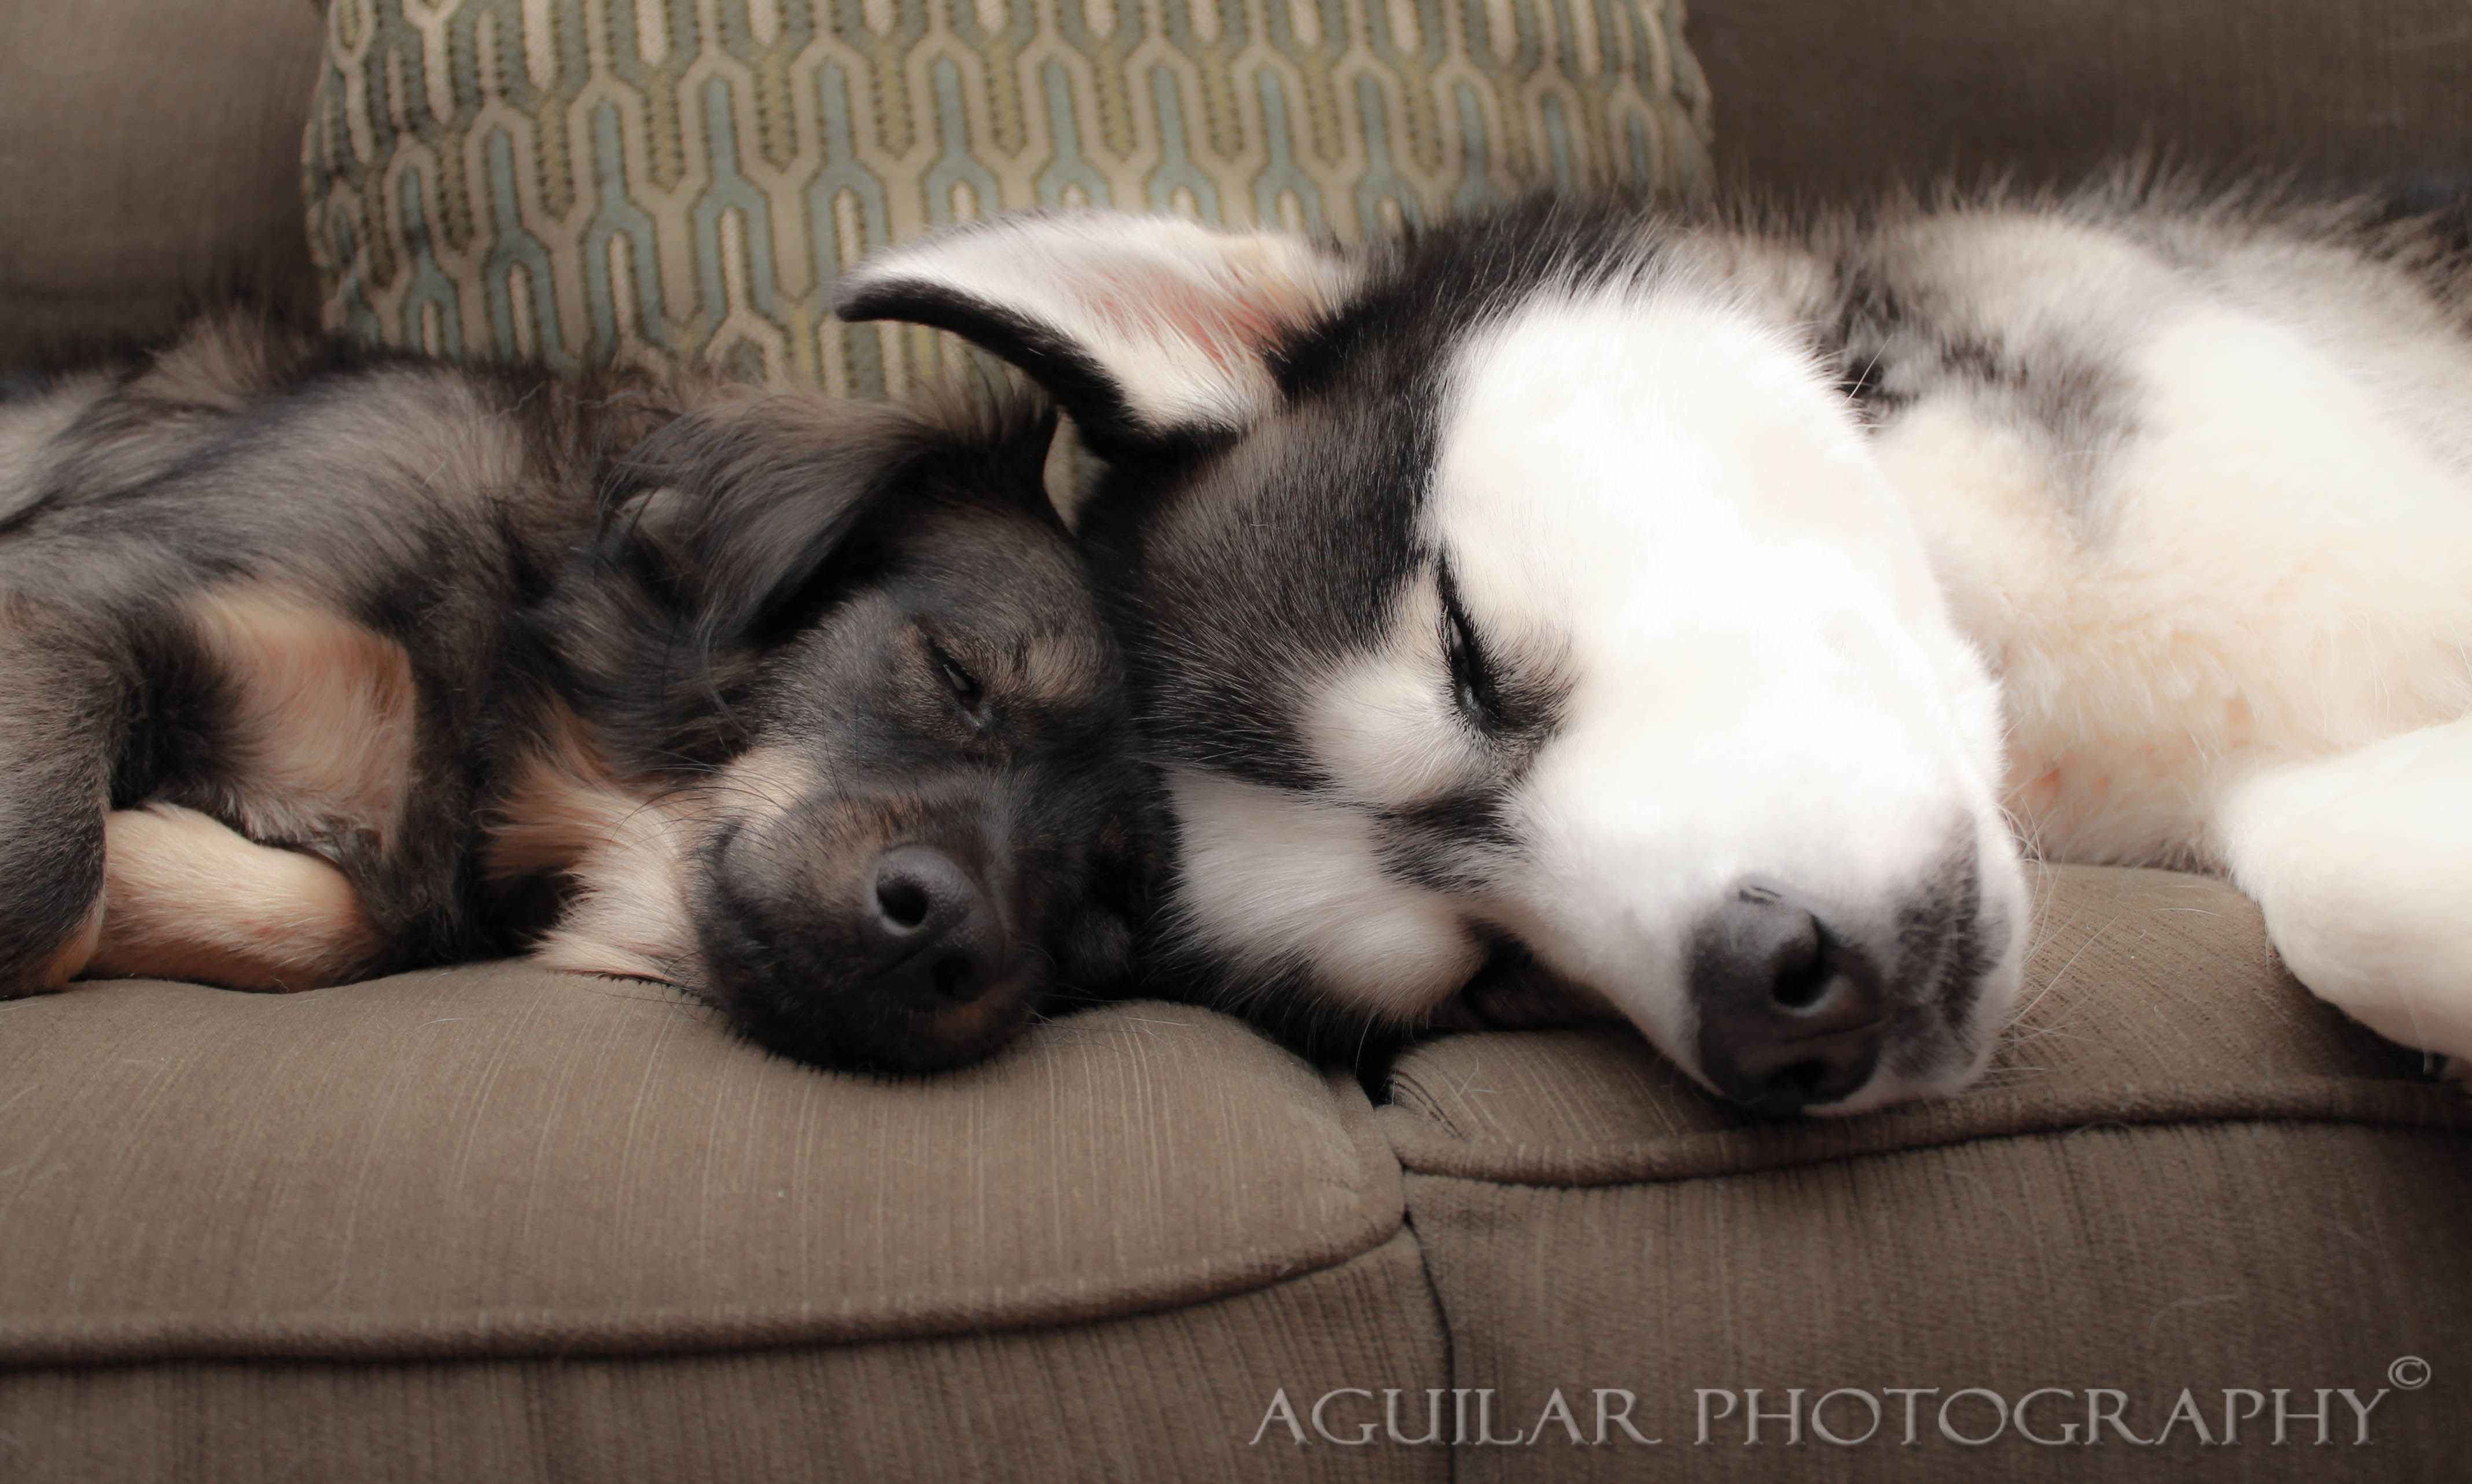 Sleepyheads - http://on.fb.me/aguilarphotography